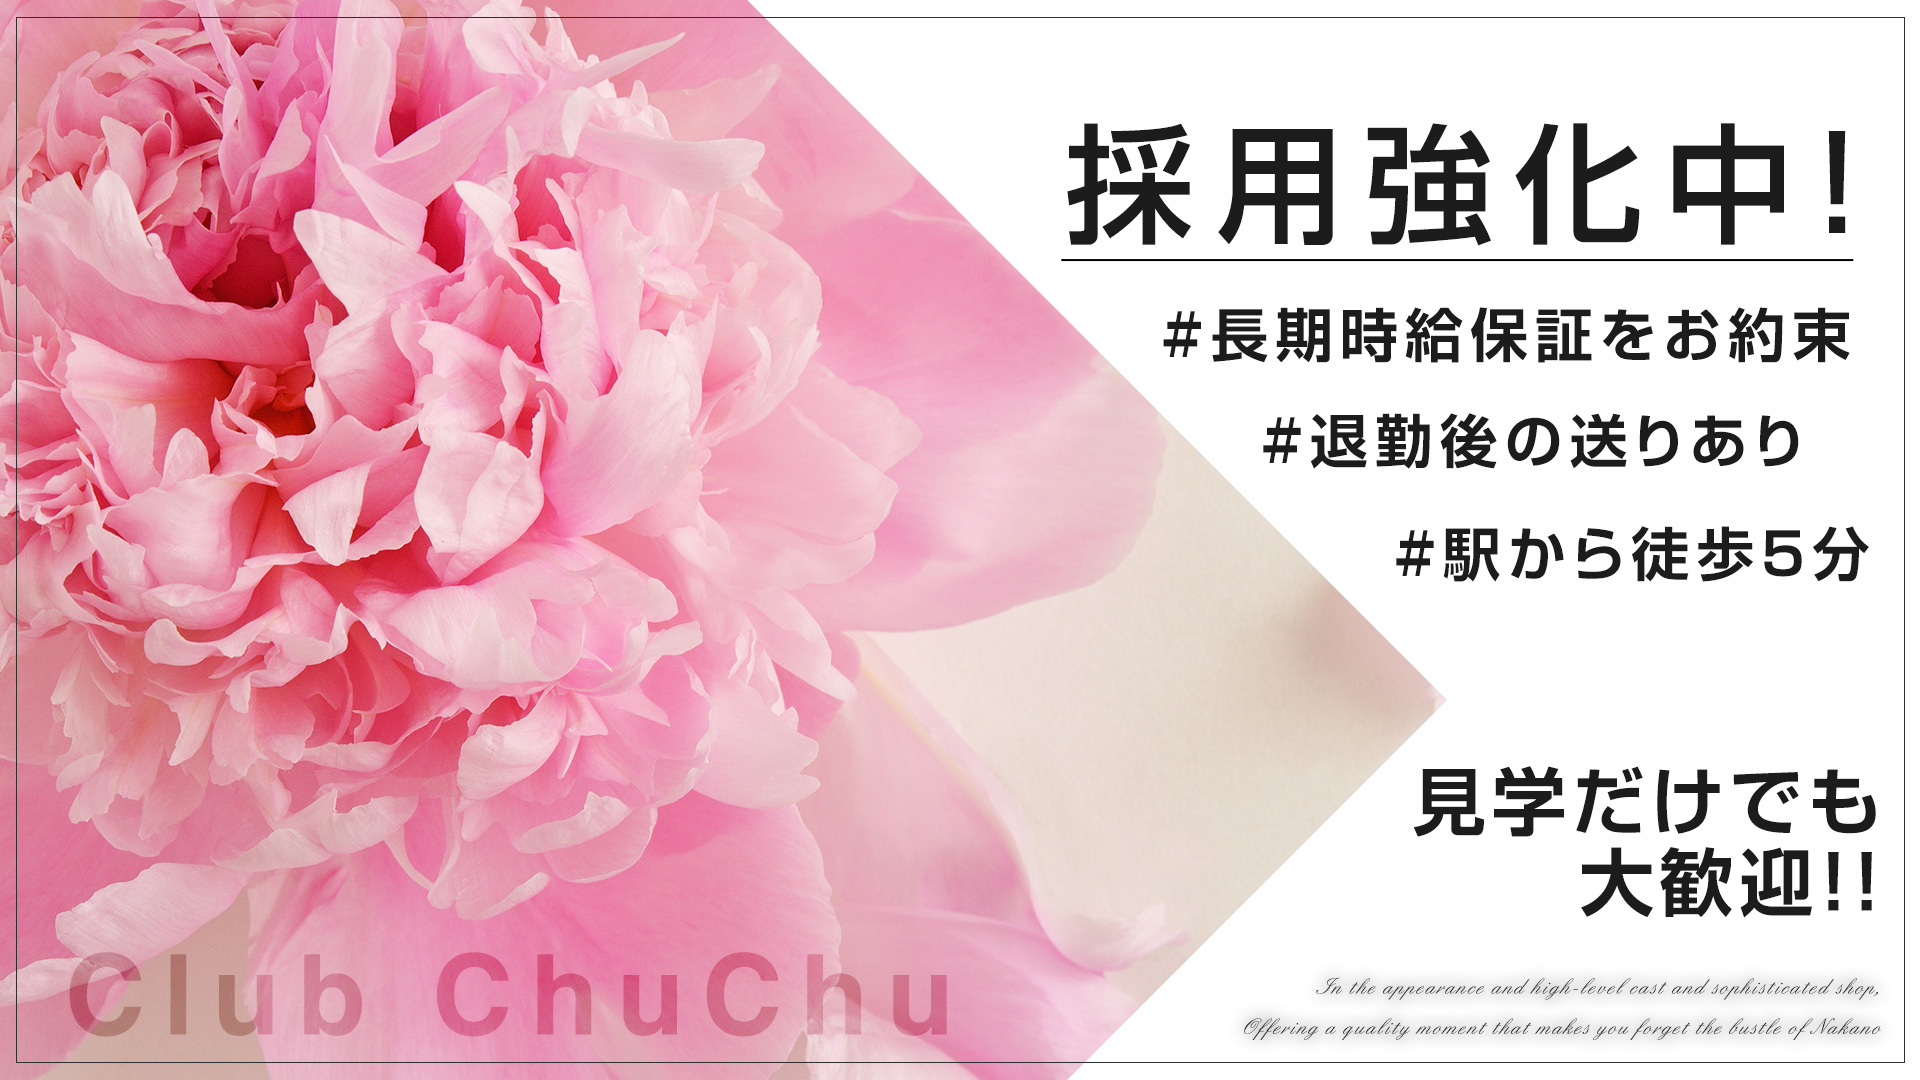 Club Chu Chu[クラブチュチュ] 中野 キャバクラ TOP画像